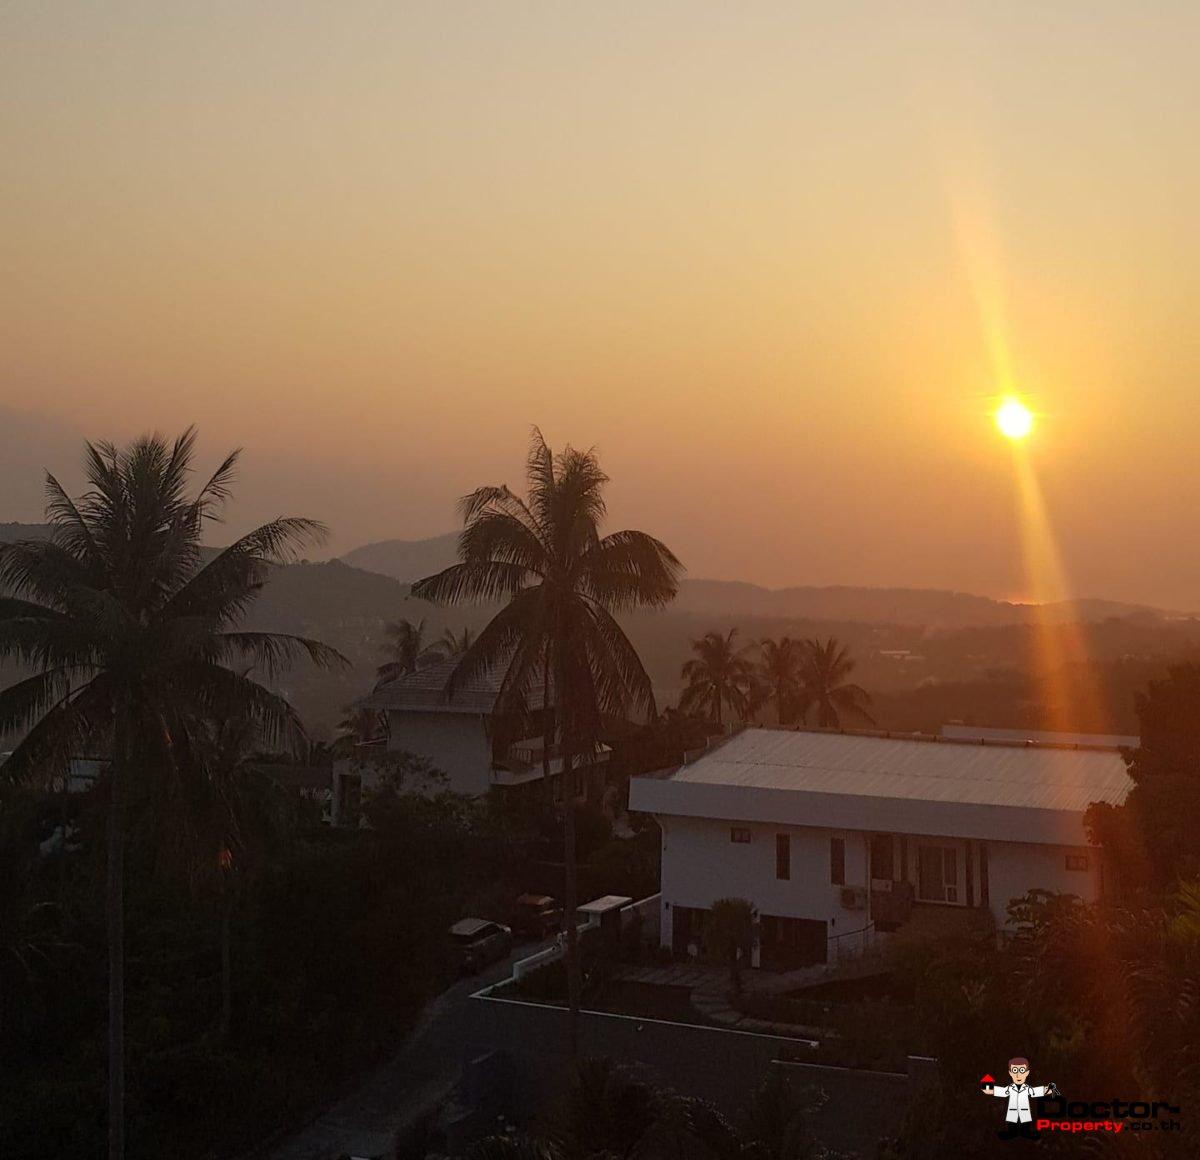 6 Bedroom Villa with Sea View - Bophut - Koh Samui - for sale 16